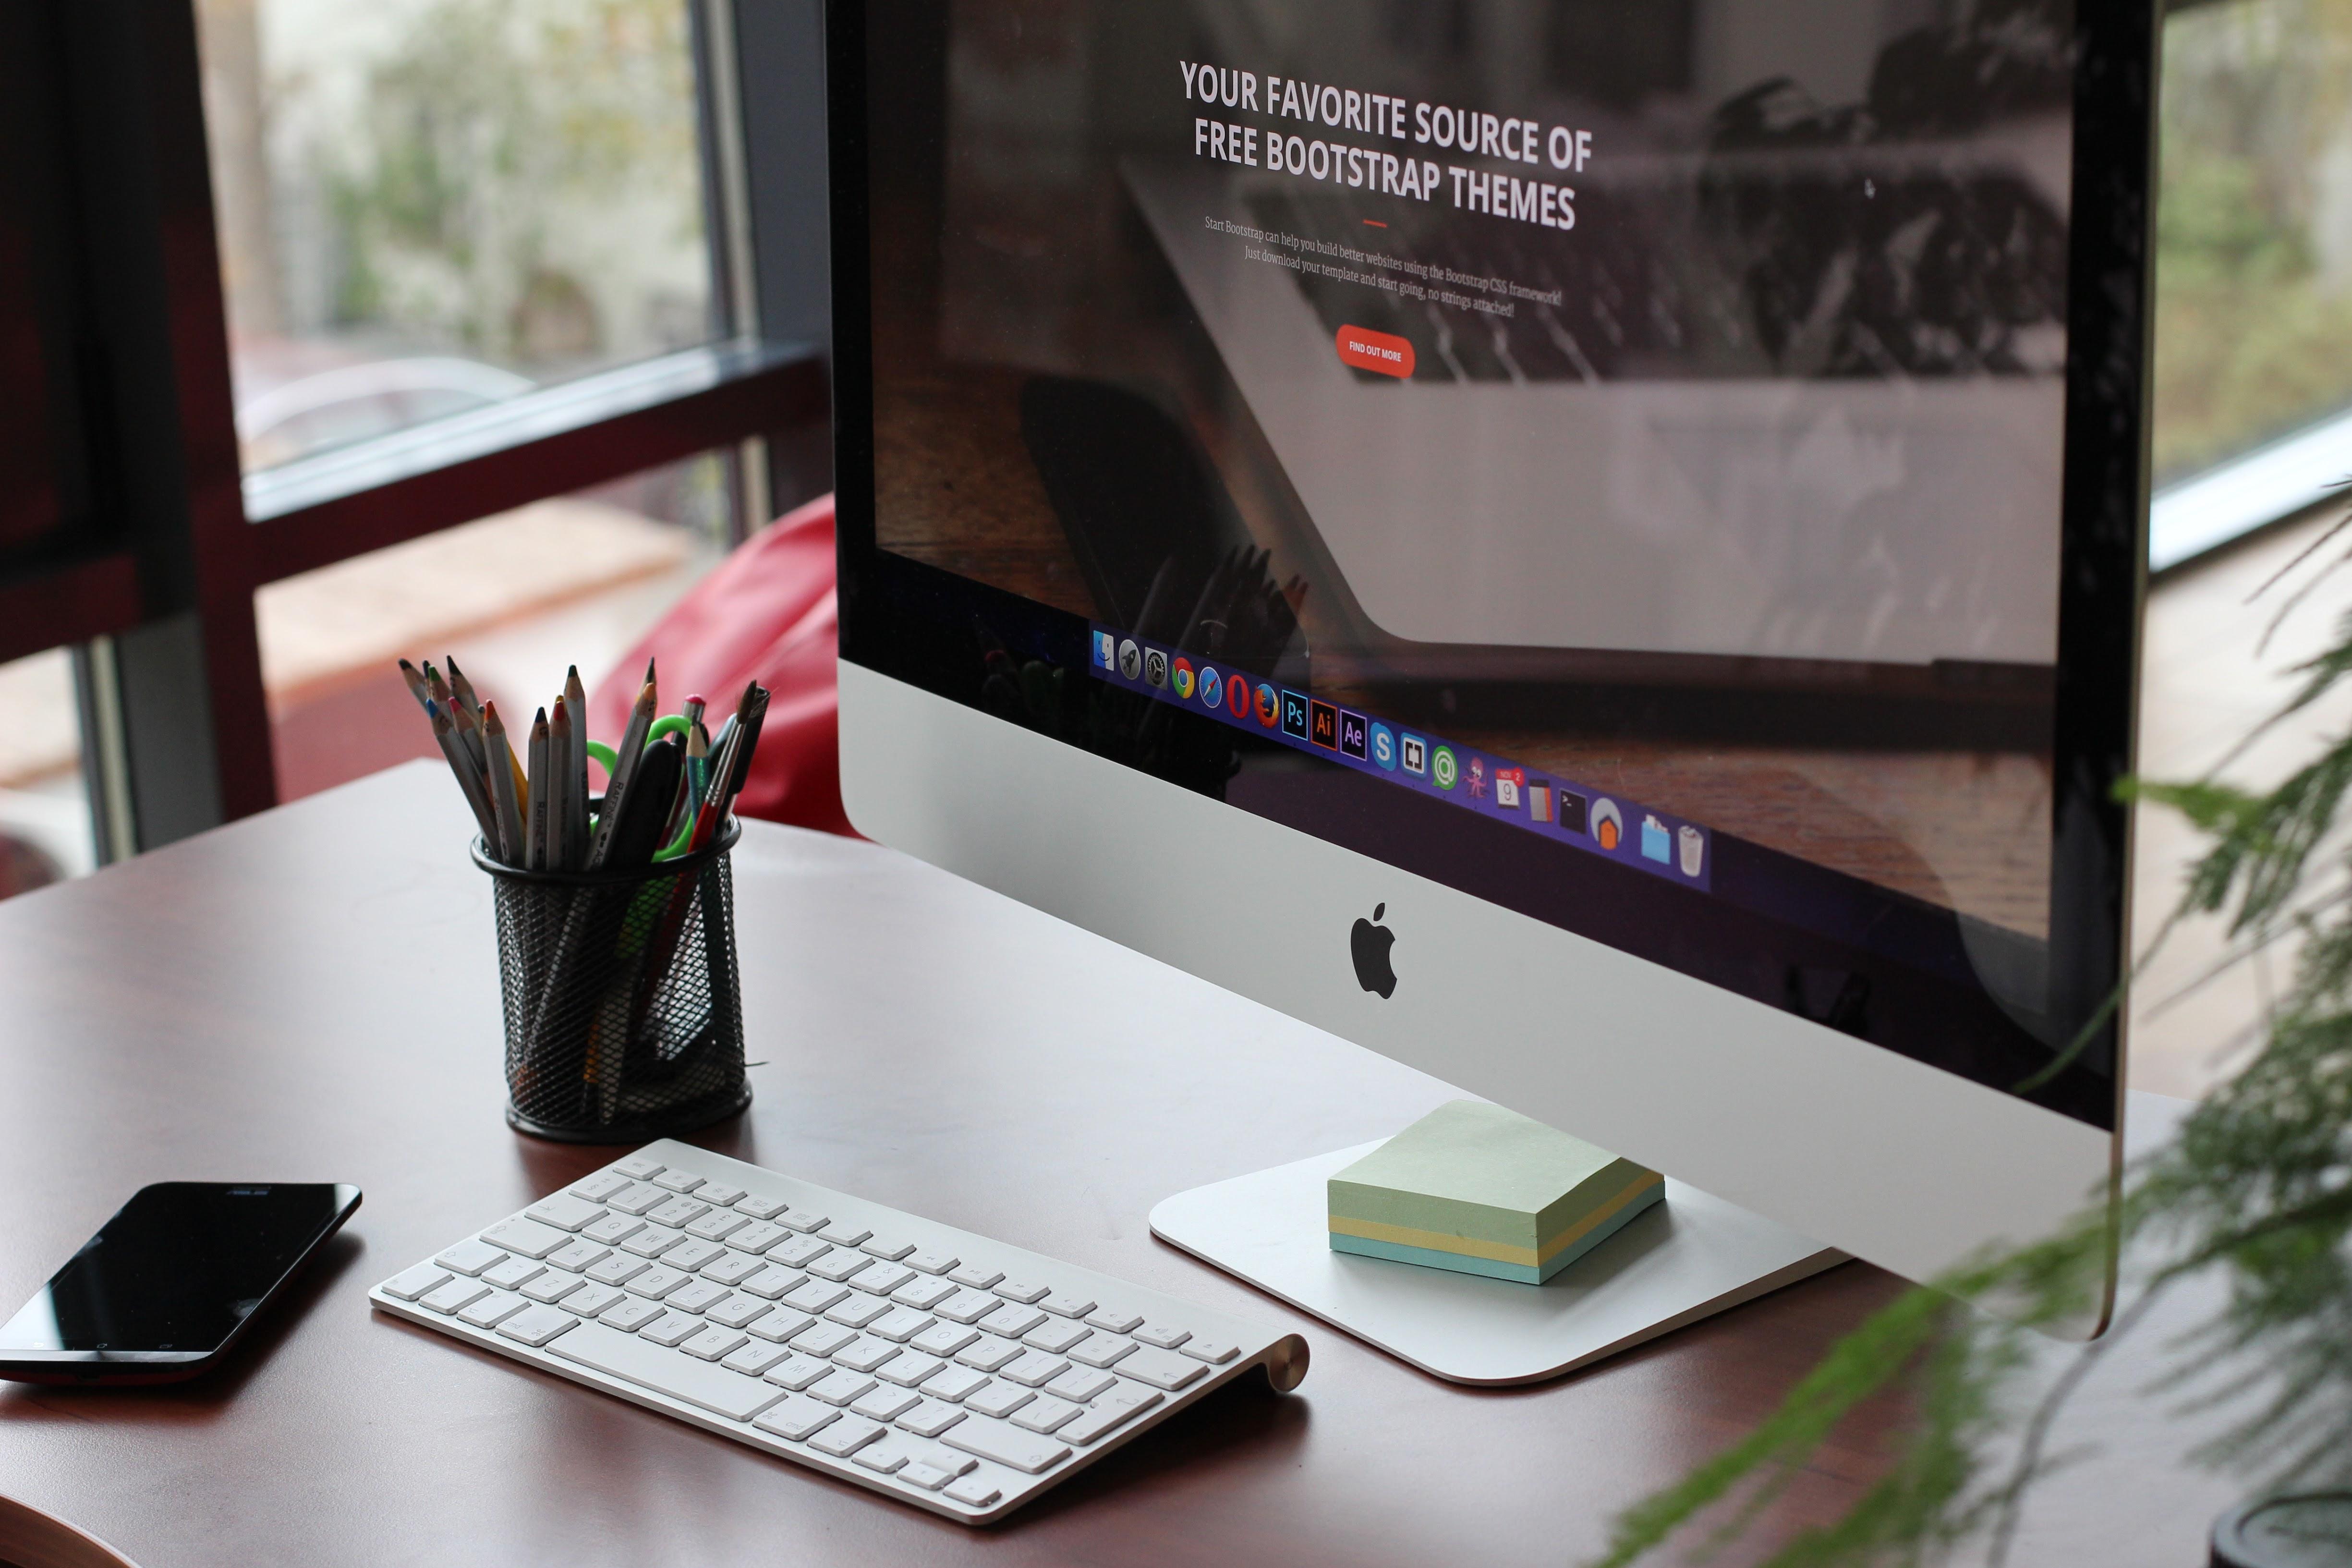 Free photo of apple computer desk display imac - stockkite.